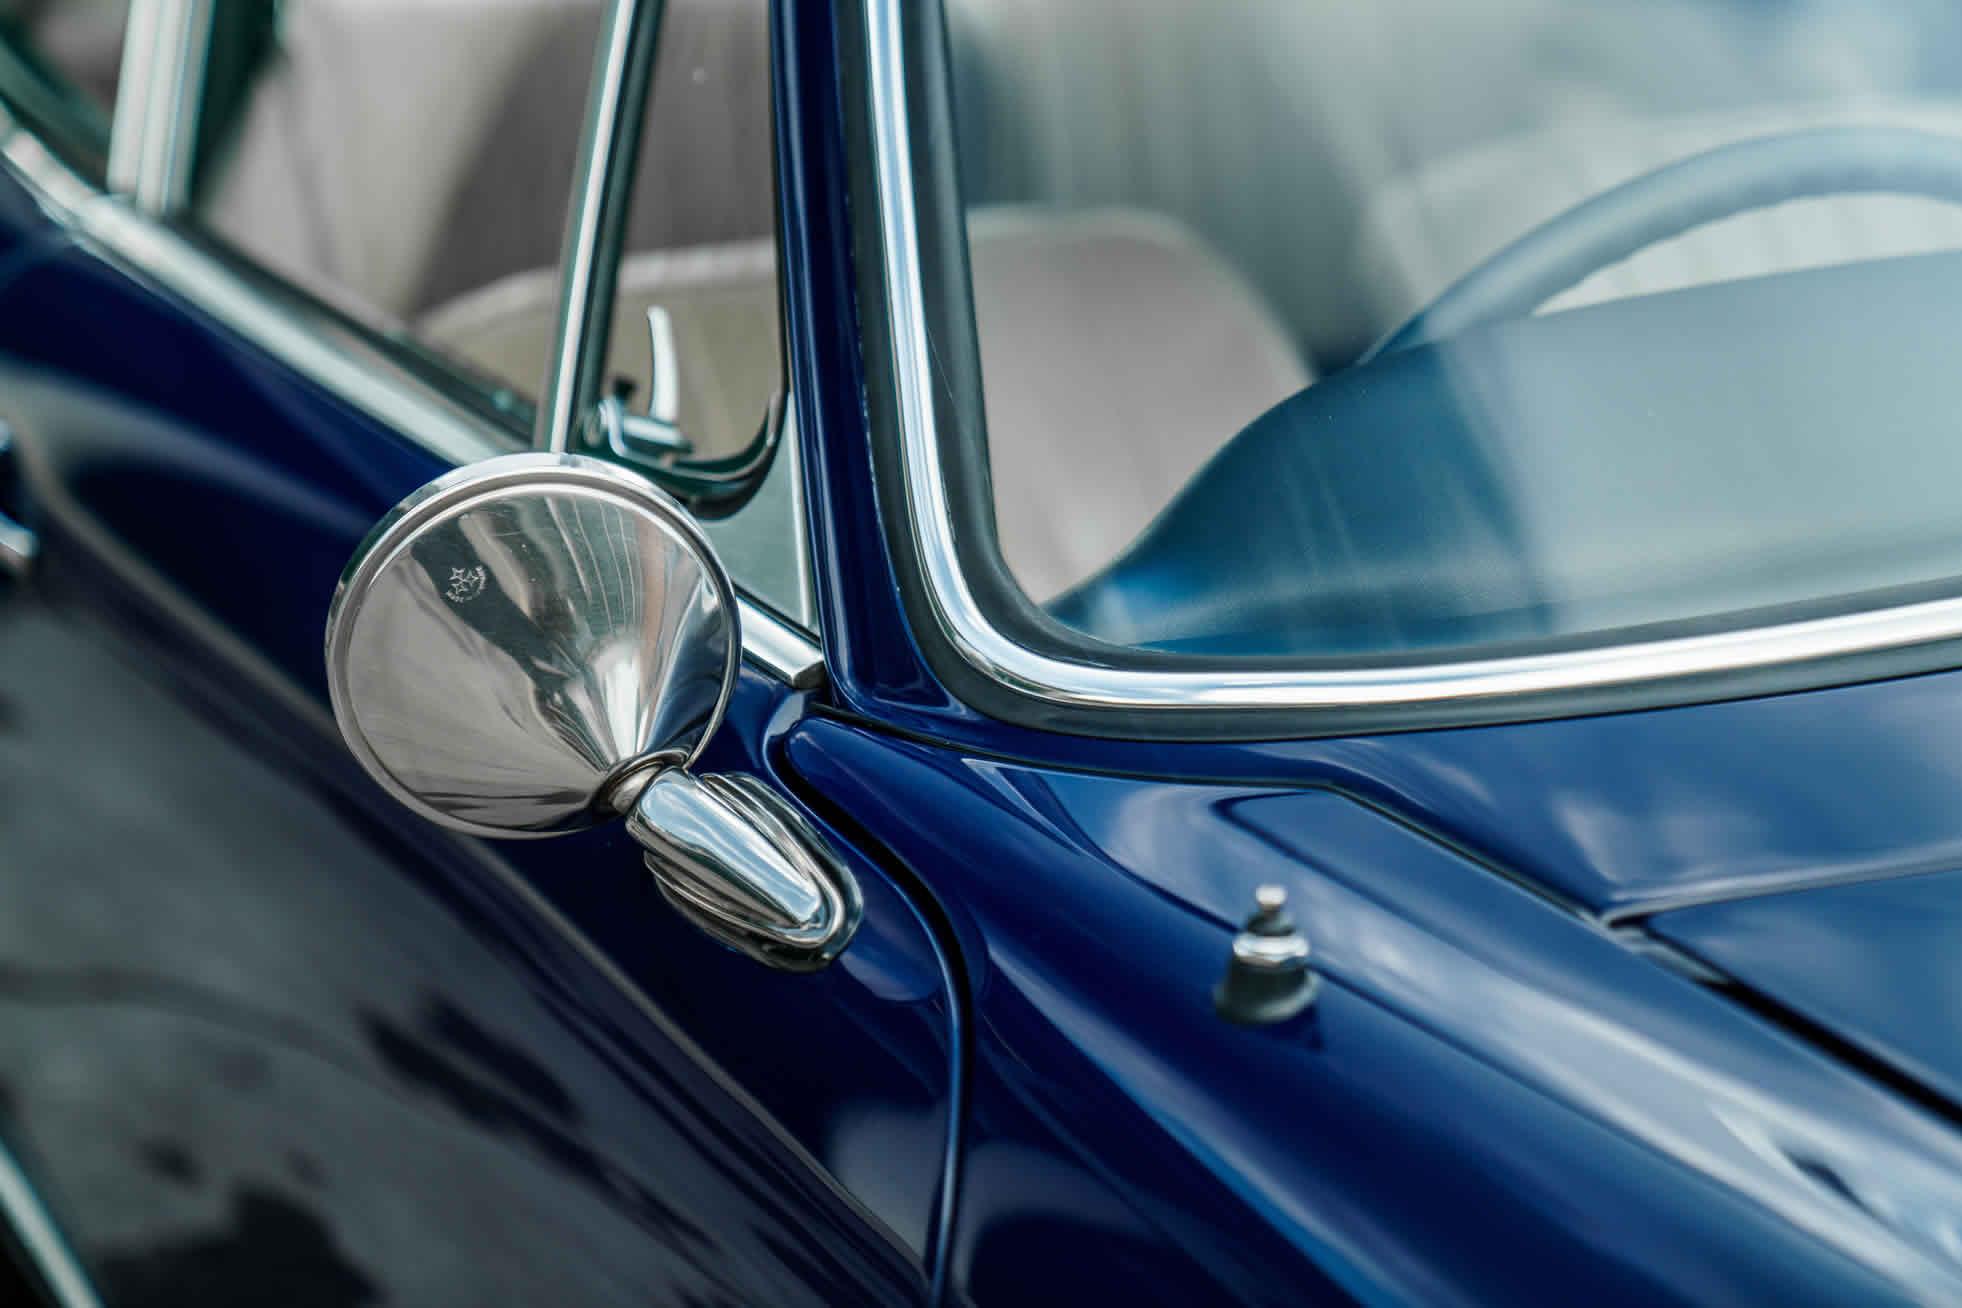 1968 Porsche 911 S For Sale. Sports Purpose Porsche Specialists, Bicester